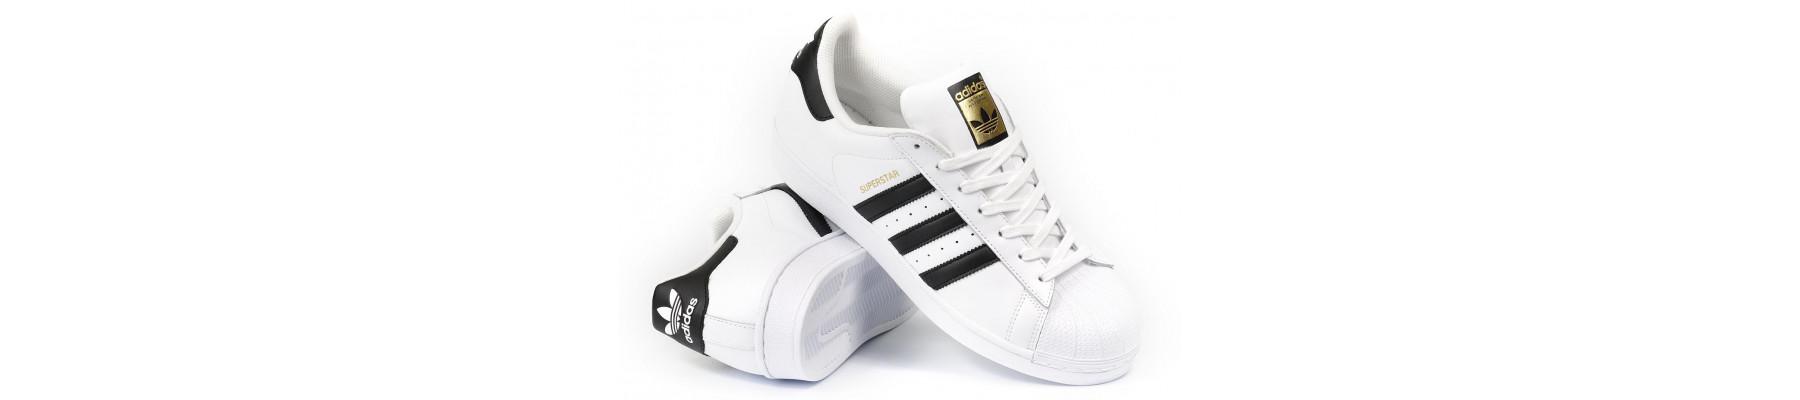 Adidas Superstar WhiteBlack